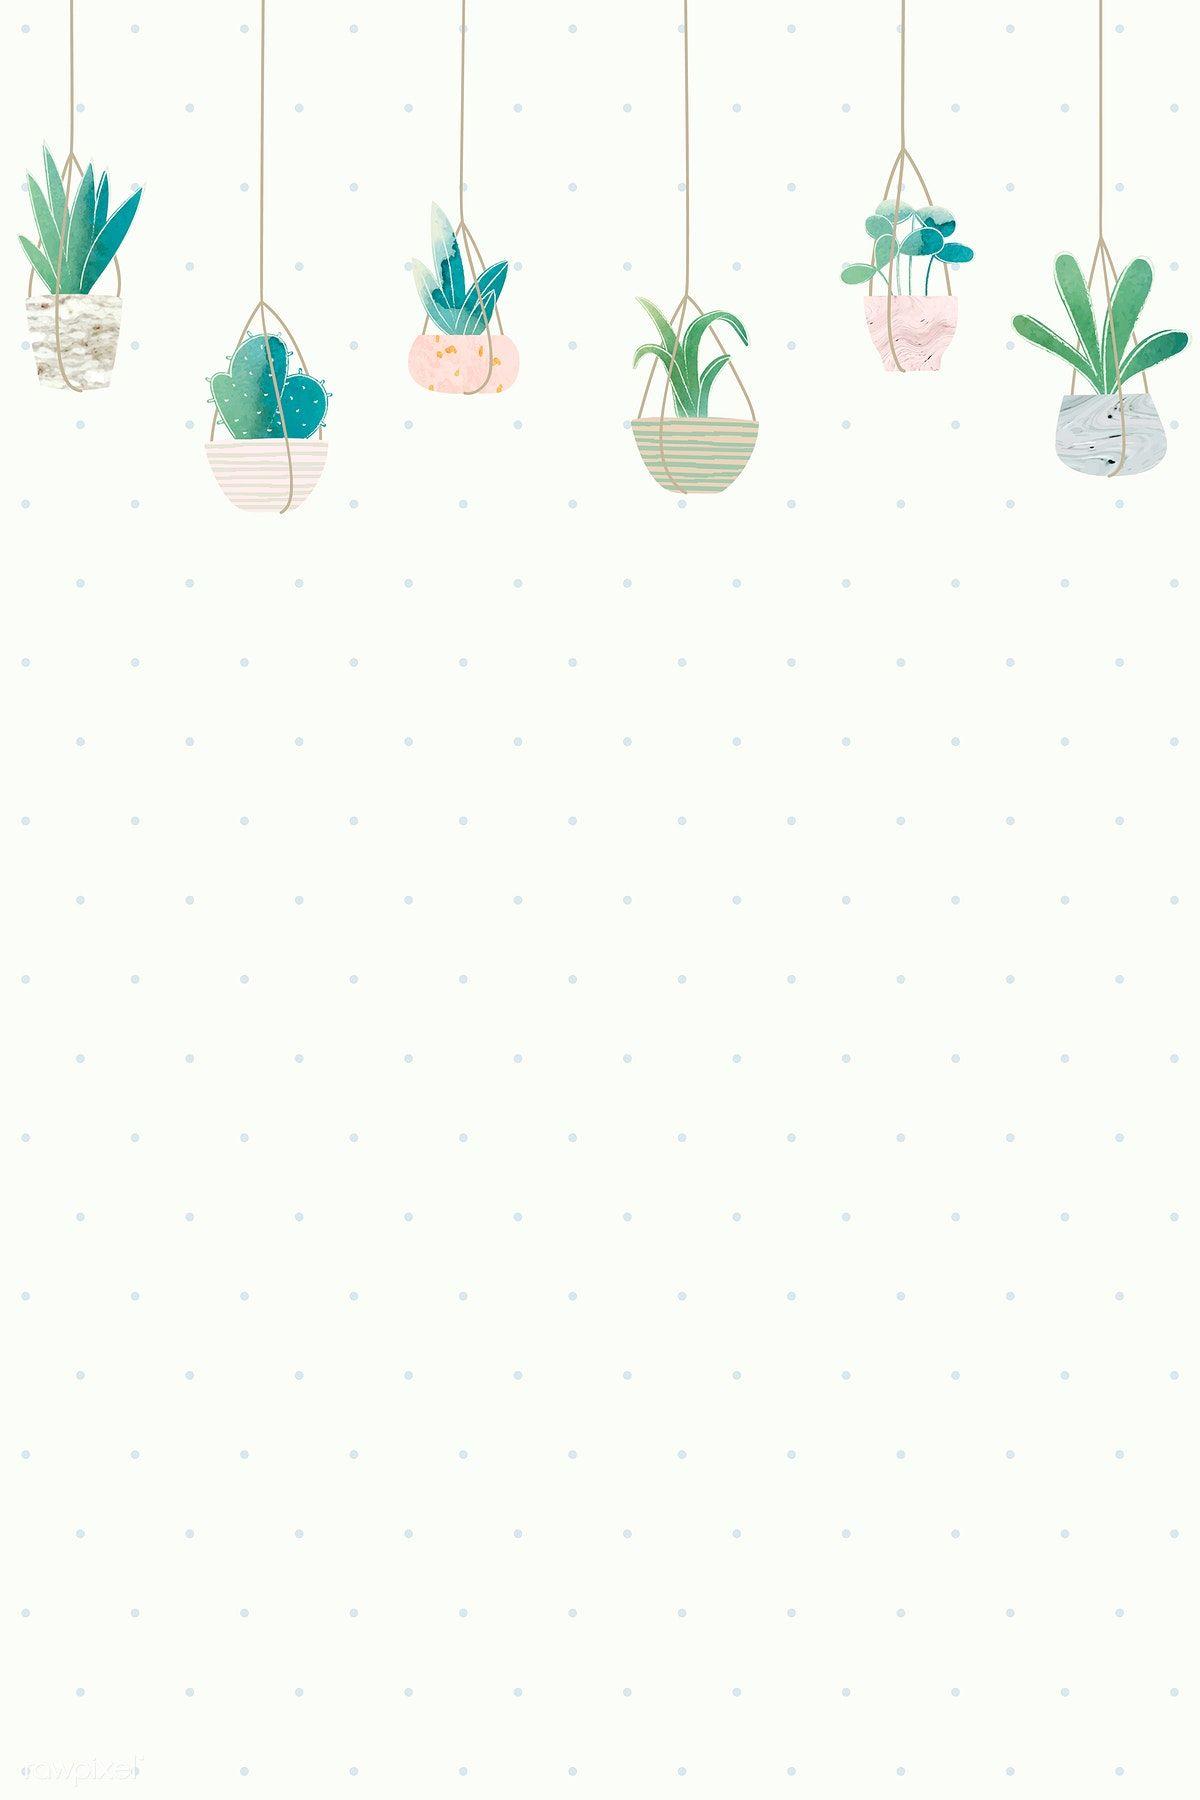 Download Premium Vector Of Blank Cactus Frame Design Vector 1017065 Cactus Illustration Cactus Backgrounds Plant Wallpaper